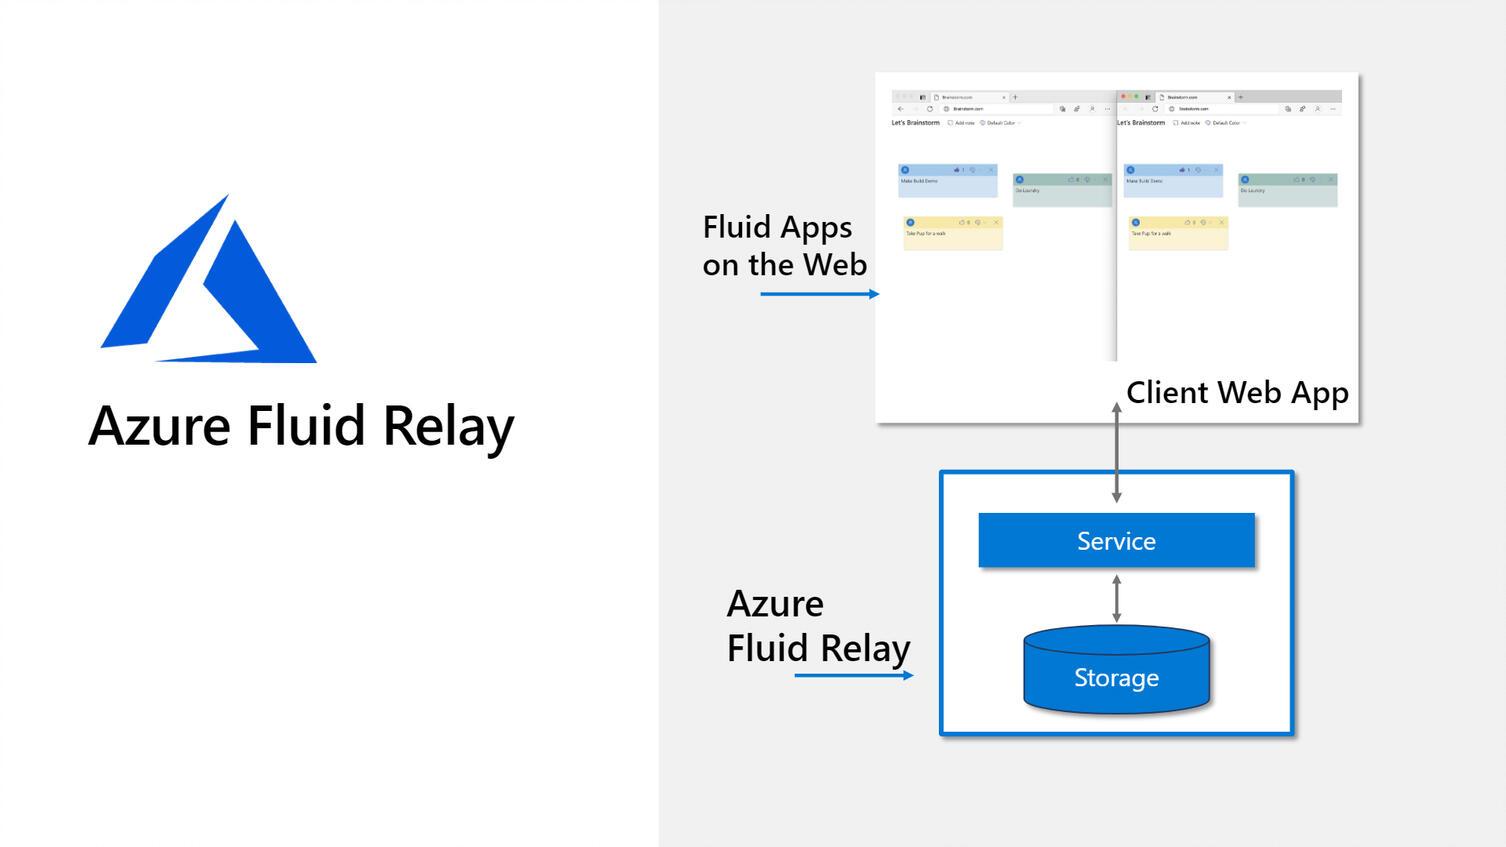 tr-fluid-azure-fluid-relay.jpg